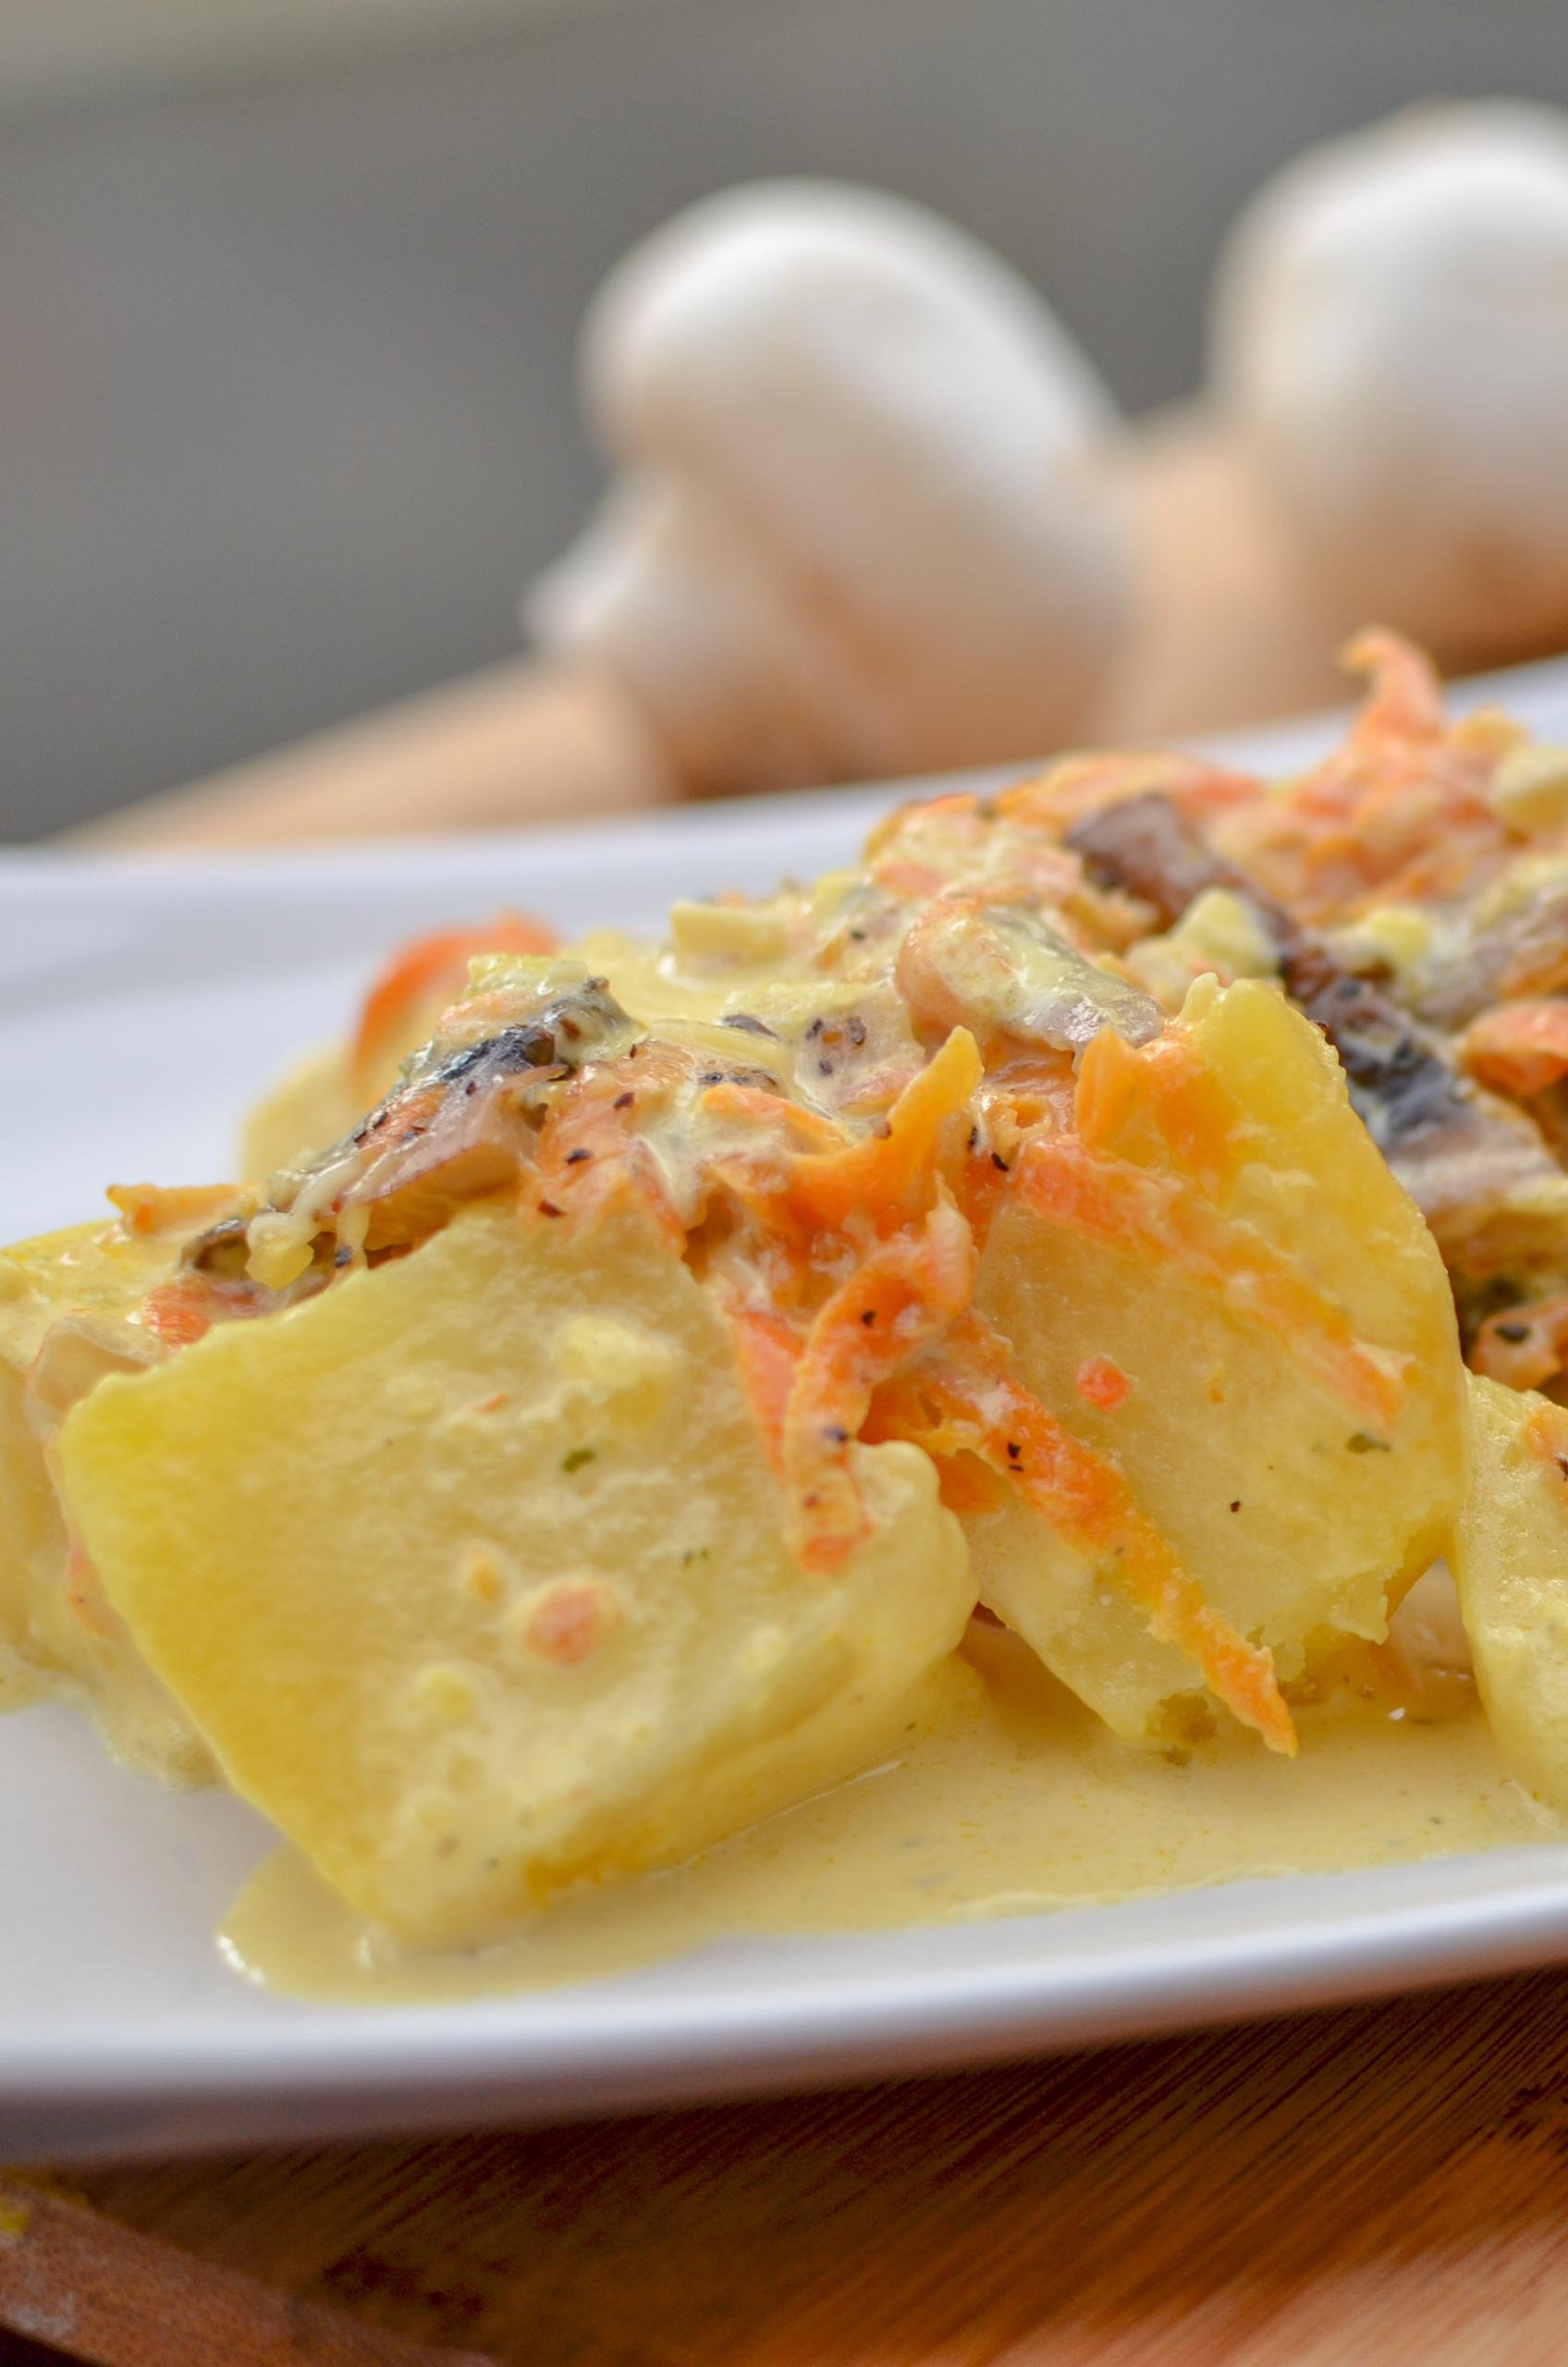 Creamy Mushroom Potatoes in a serving plate